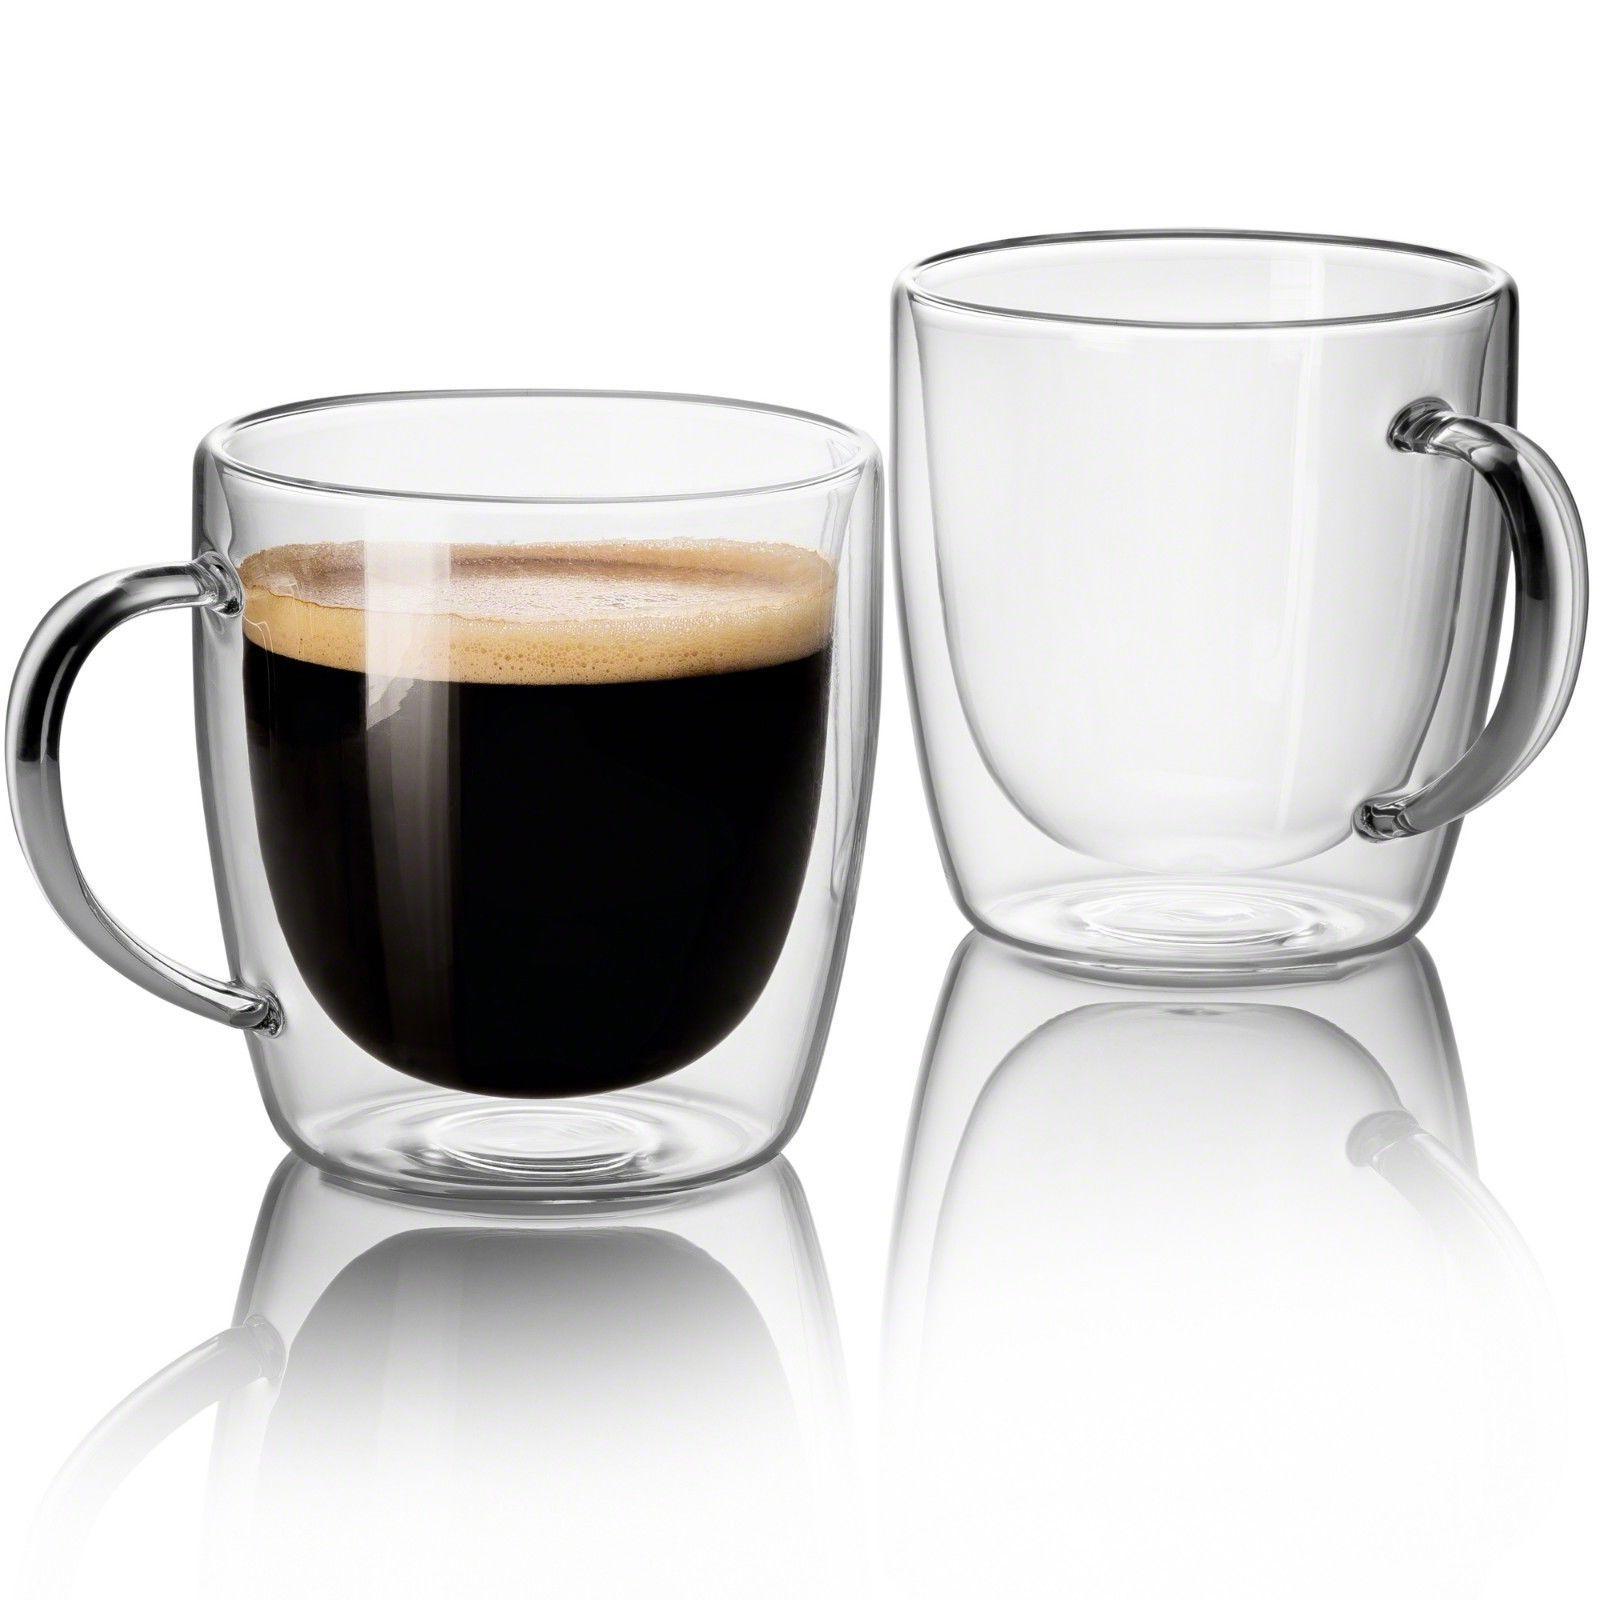 Double Mug Tea Mug